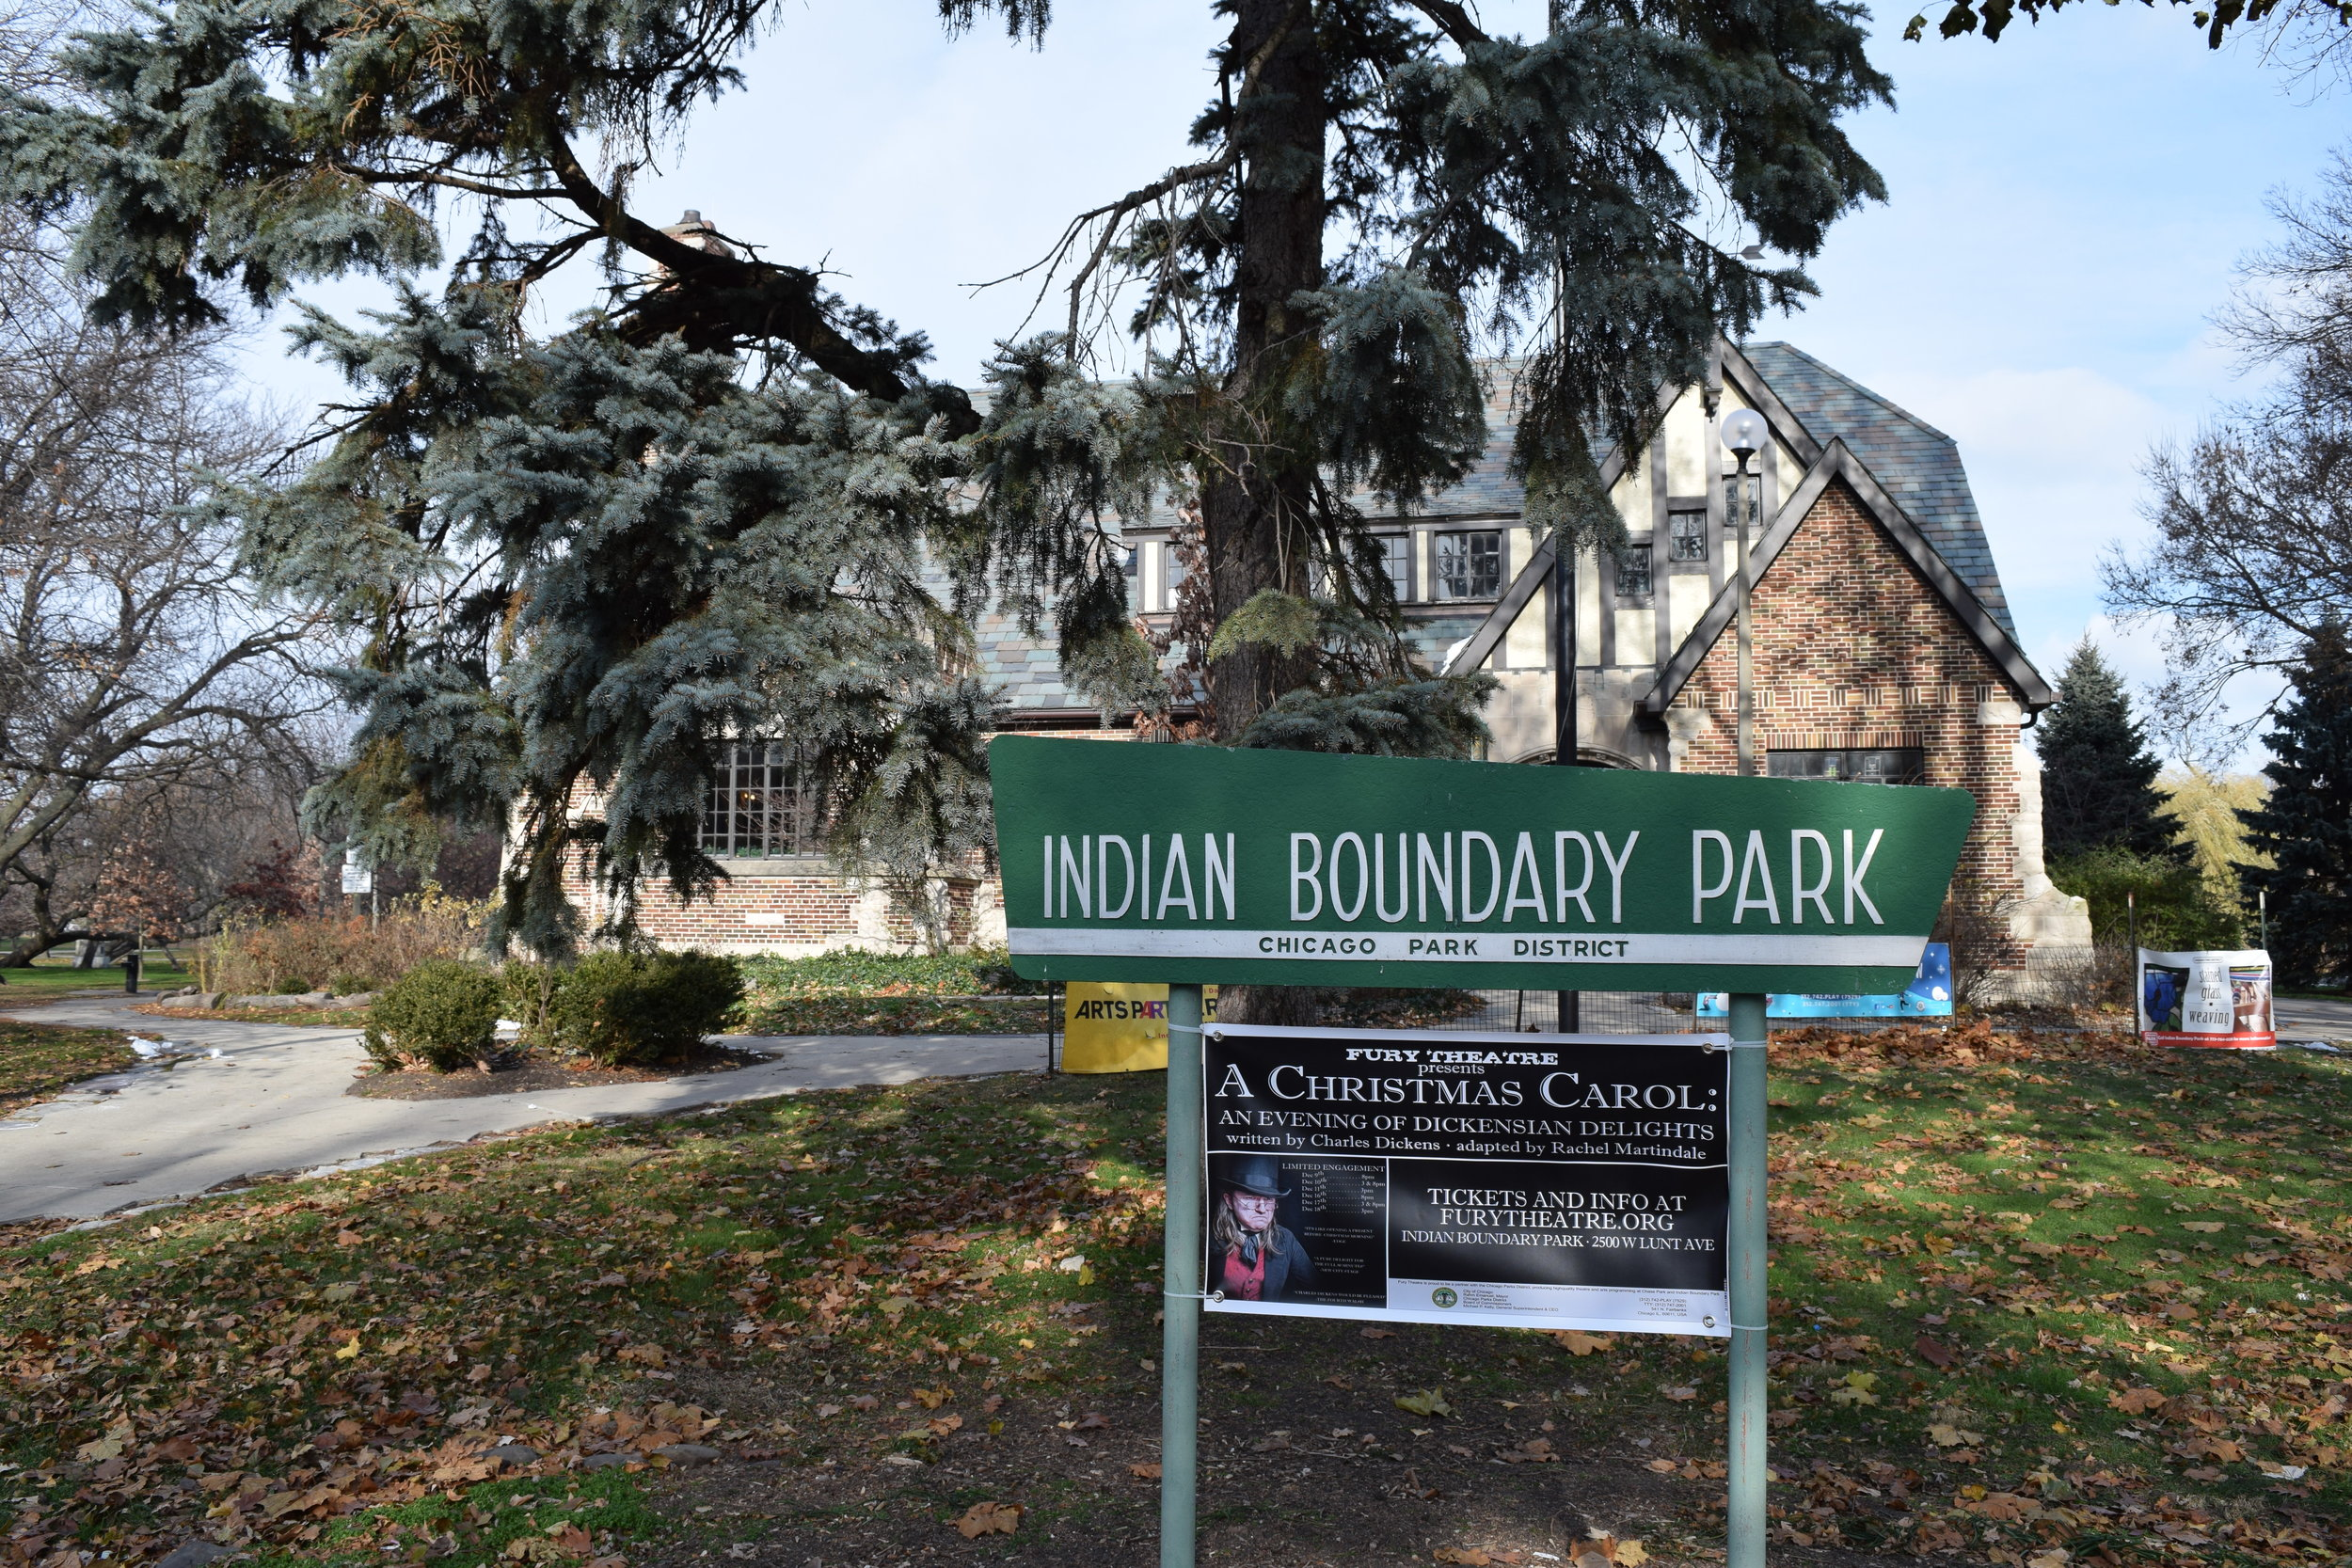 Indian Boundary Park